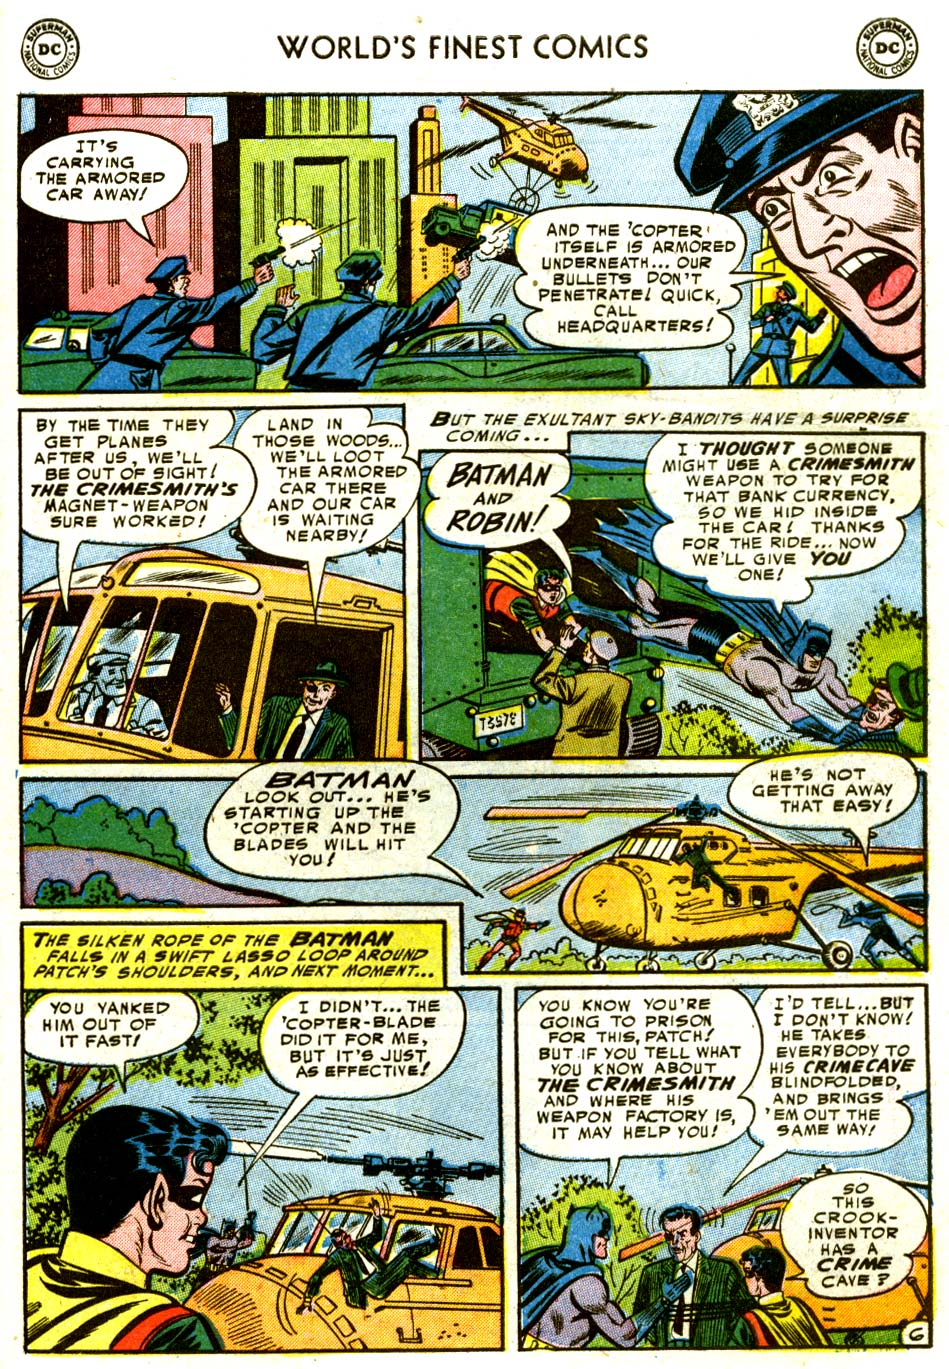 Read online World's Finest Comics comic -  Issue #68 - 59